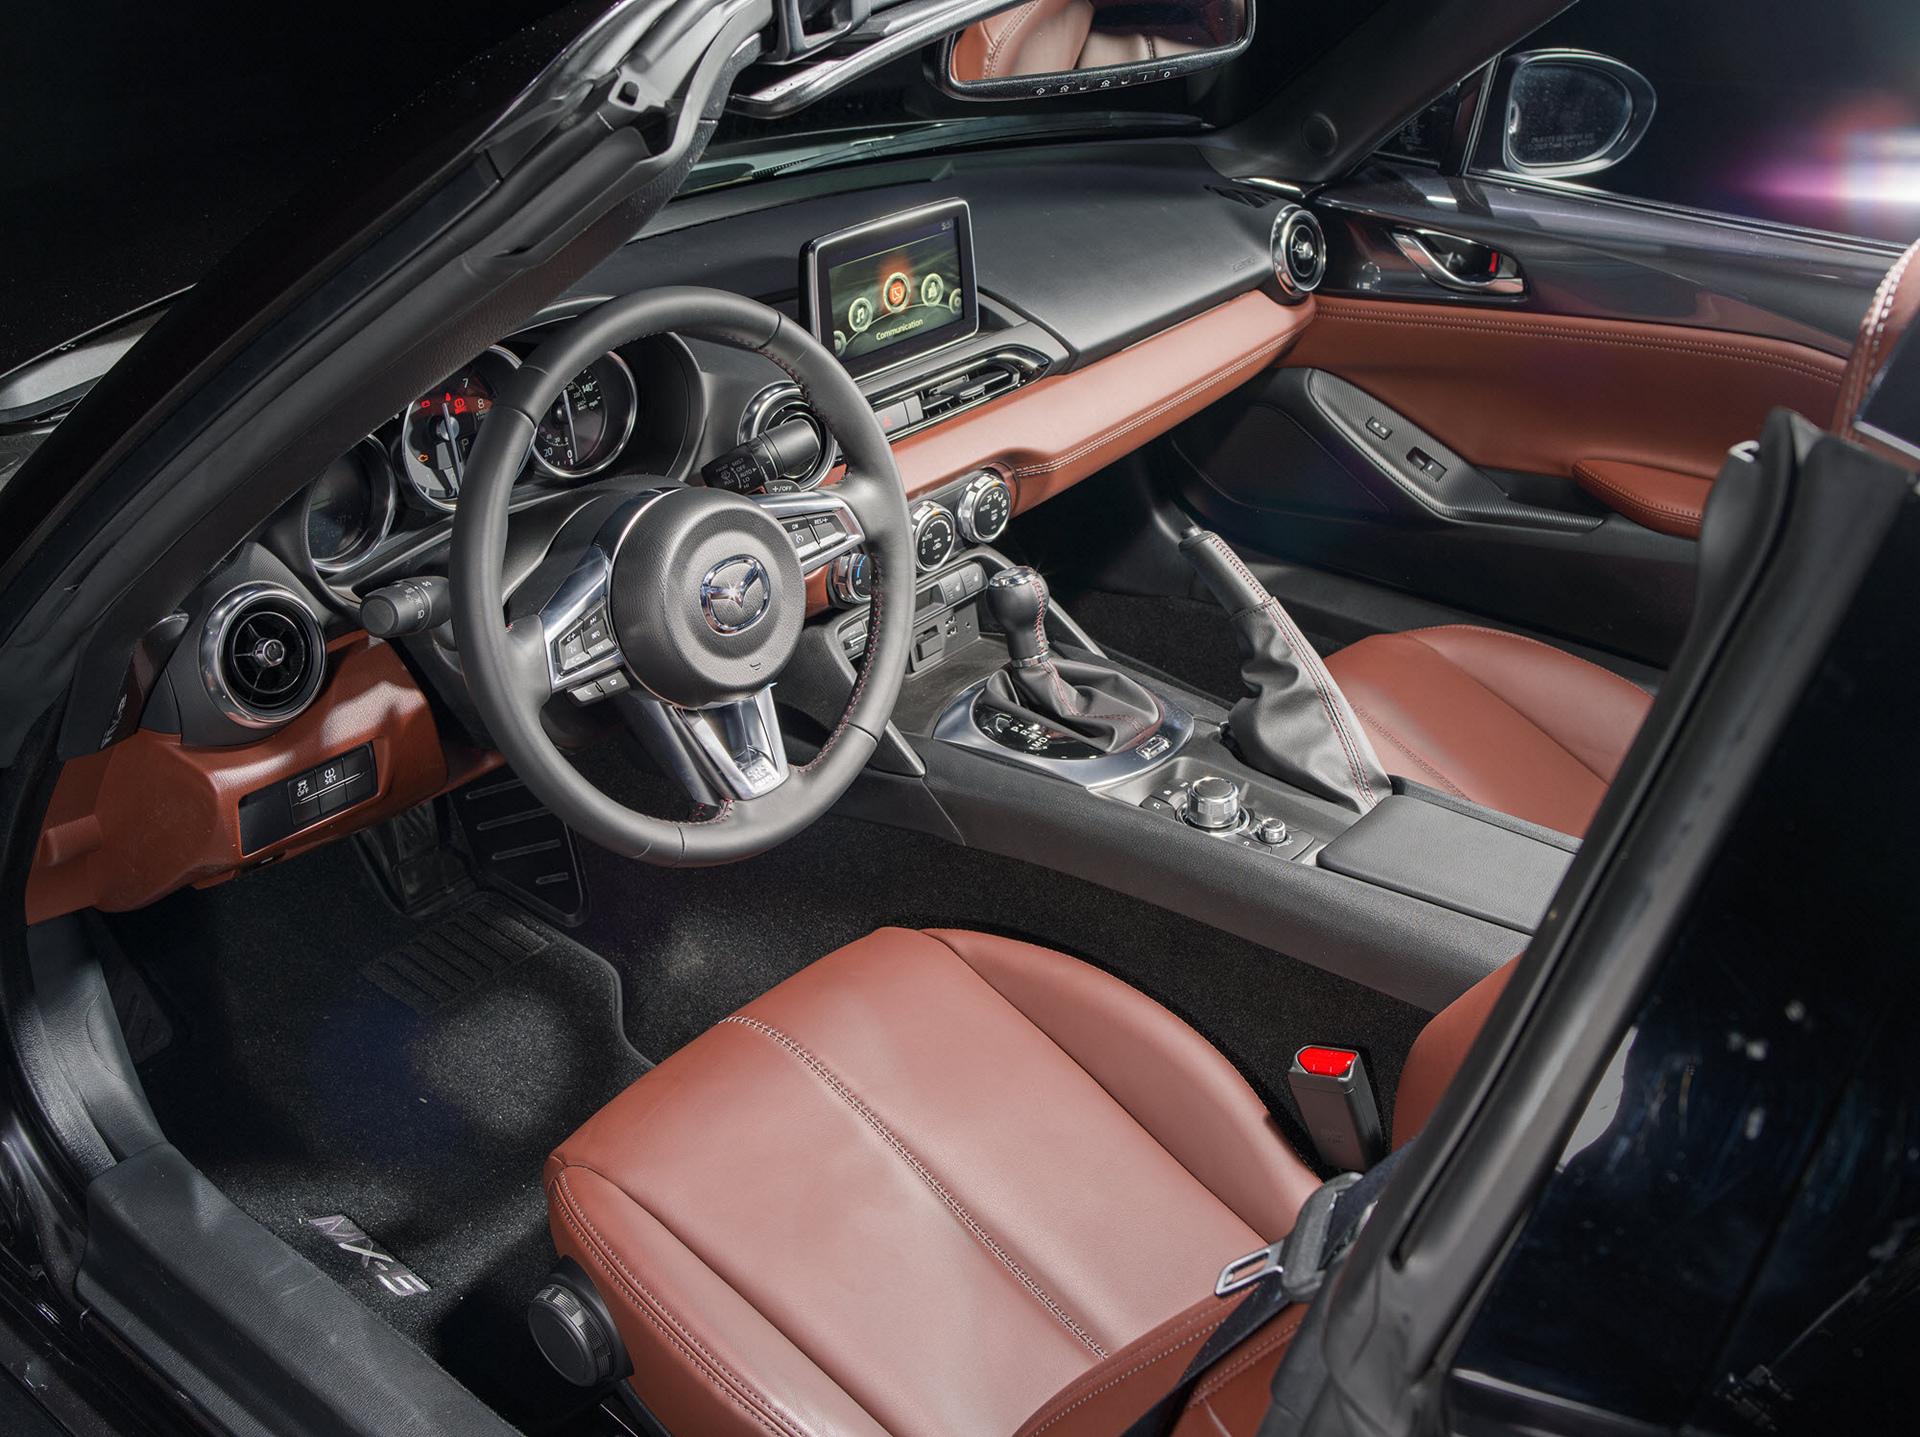 Mazda MX-5 Miata RF © Mazda Motor Corporation